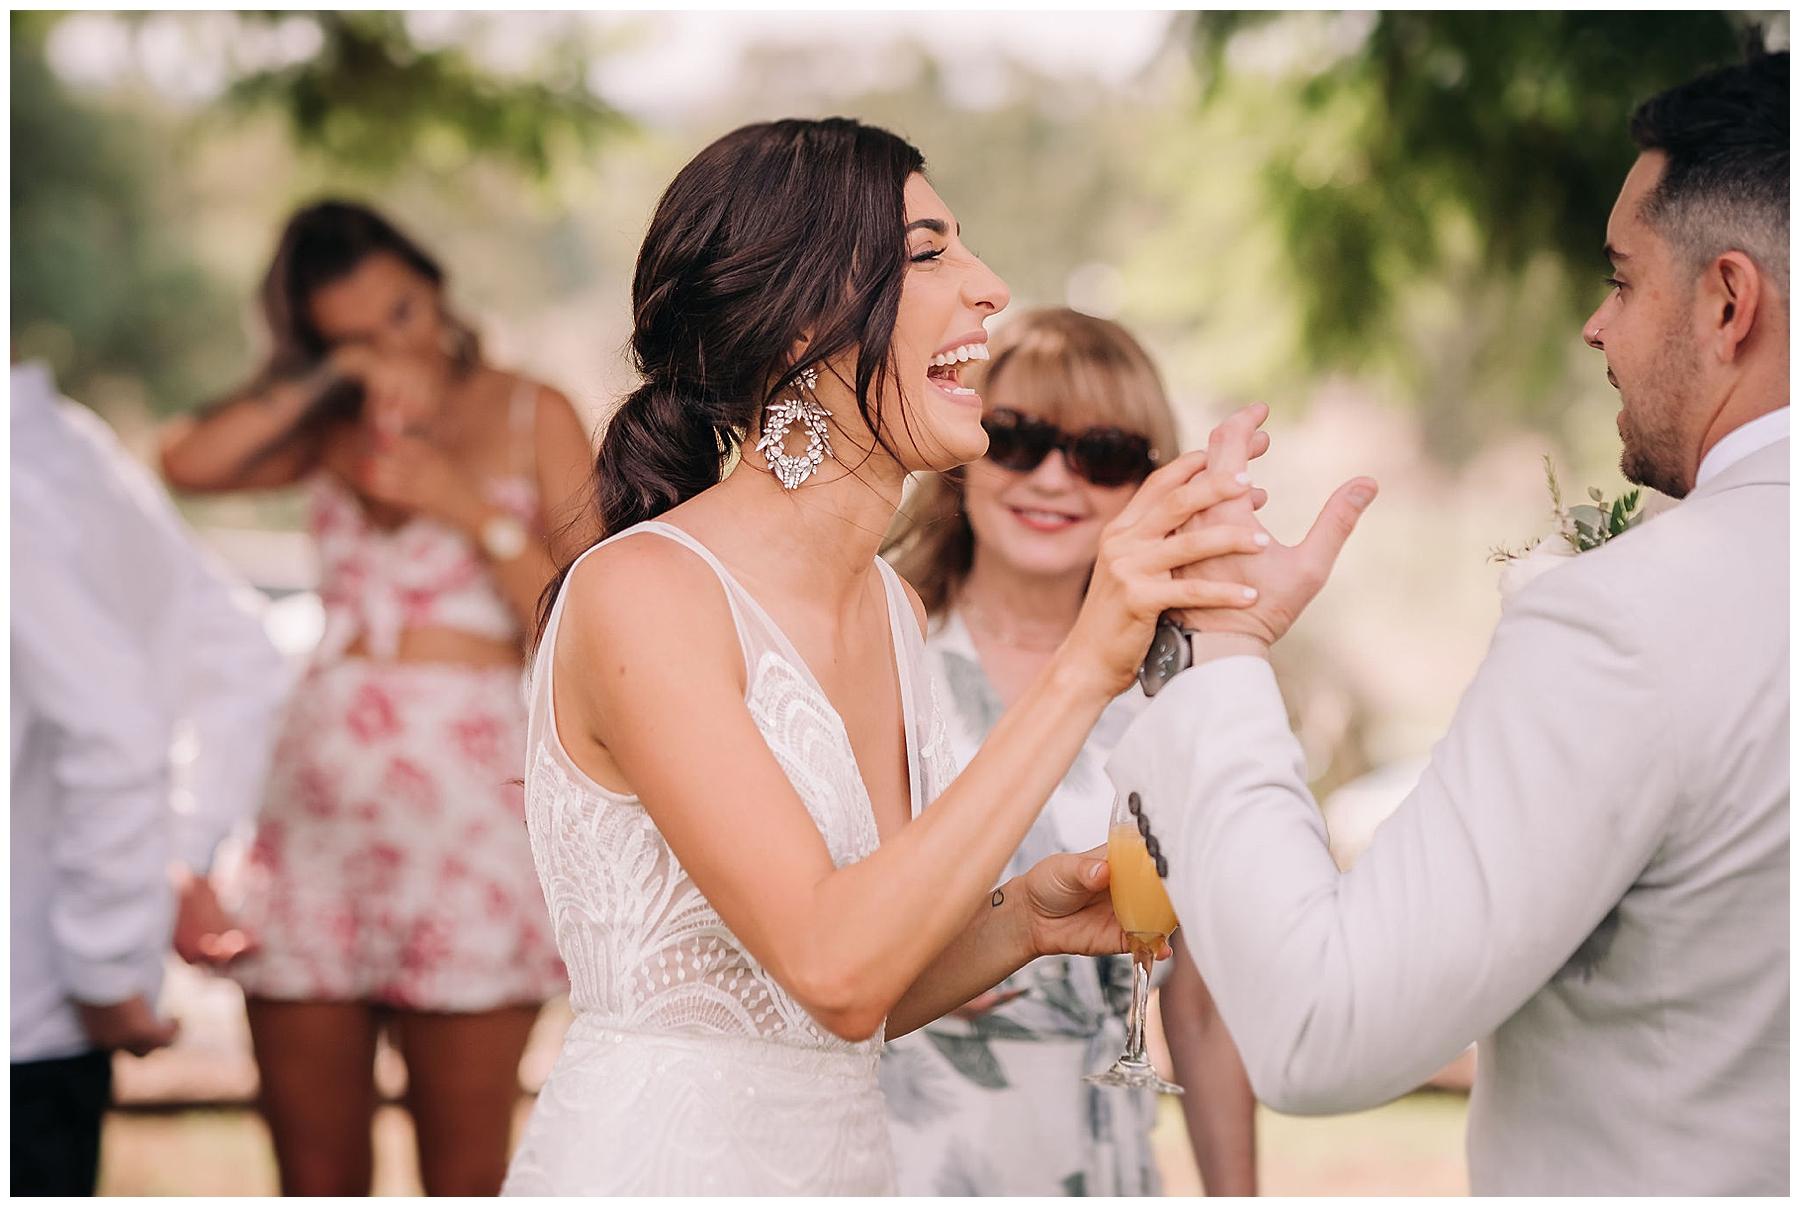 Adam's Peak Wedding Photos + Popcorn Photography_0036.jpg